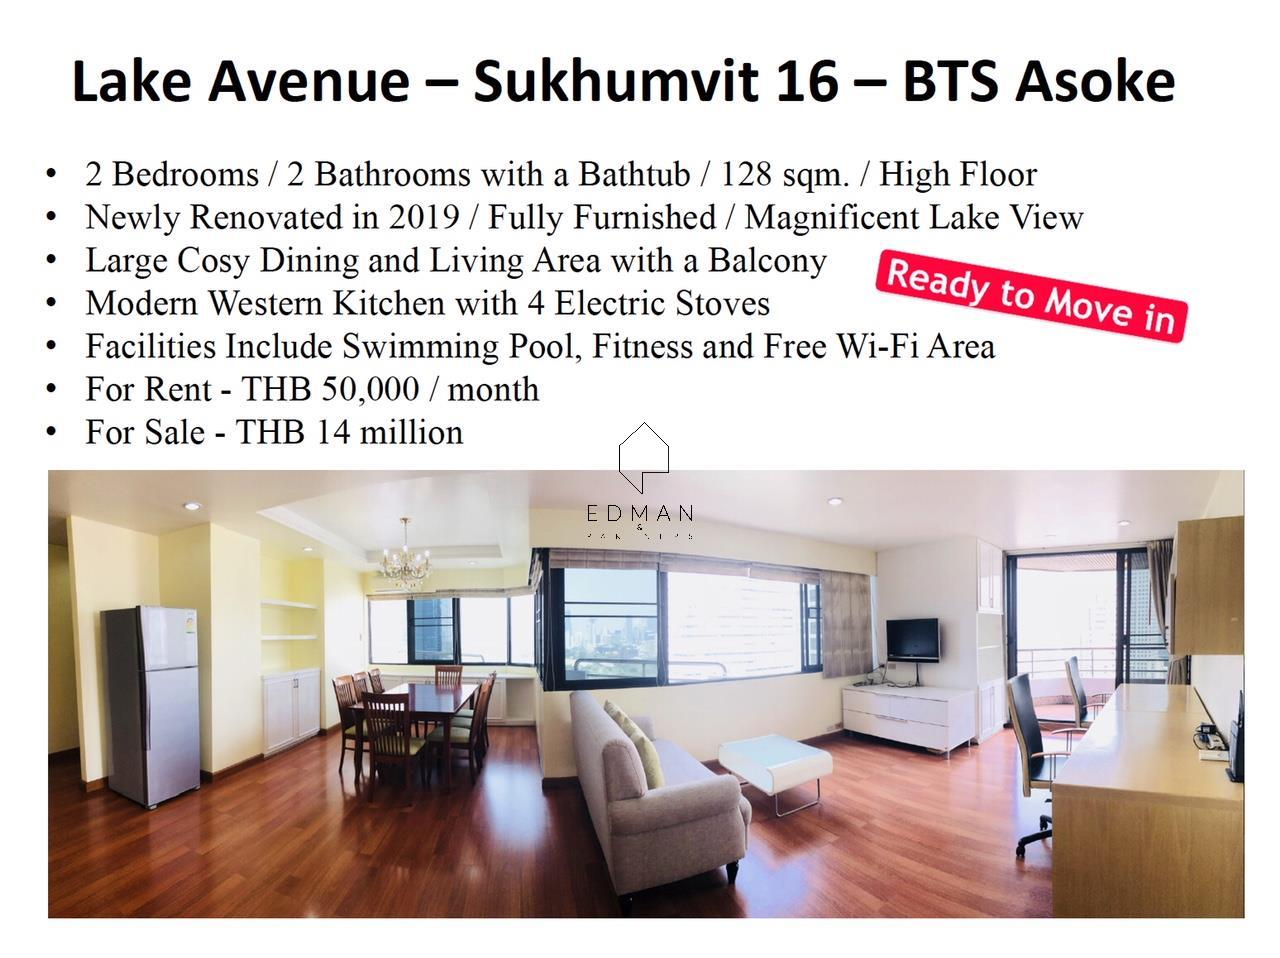 Edman and Partners Co.,Ltd Agency's Lake Avenue Condo Sukhumvit 16 -BTS Asoke 1